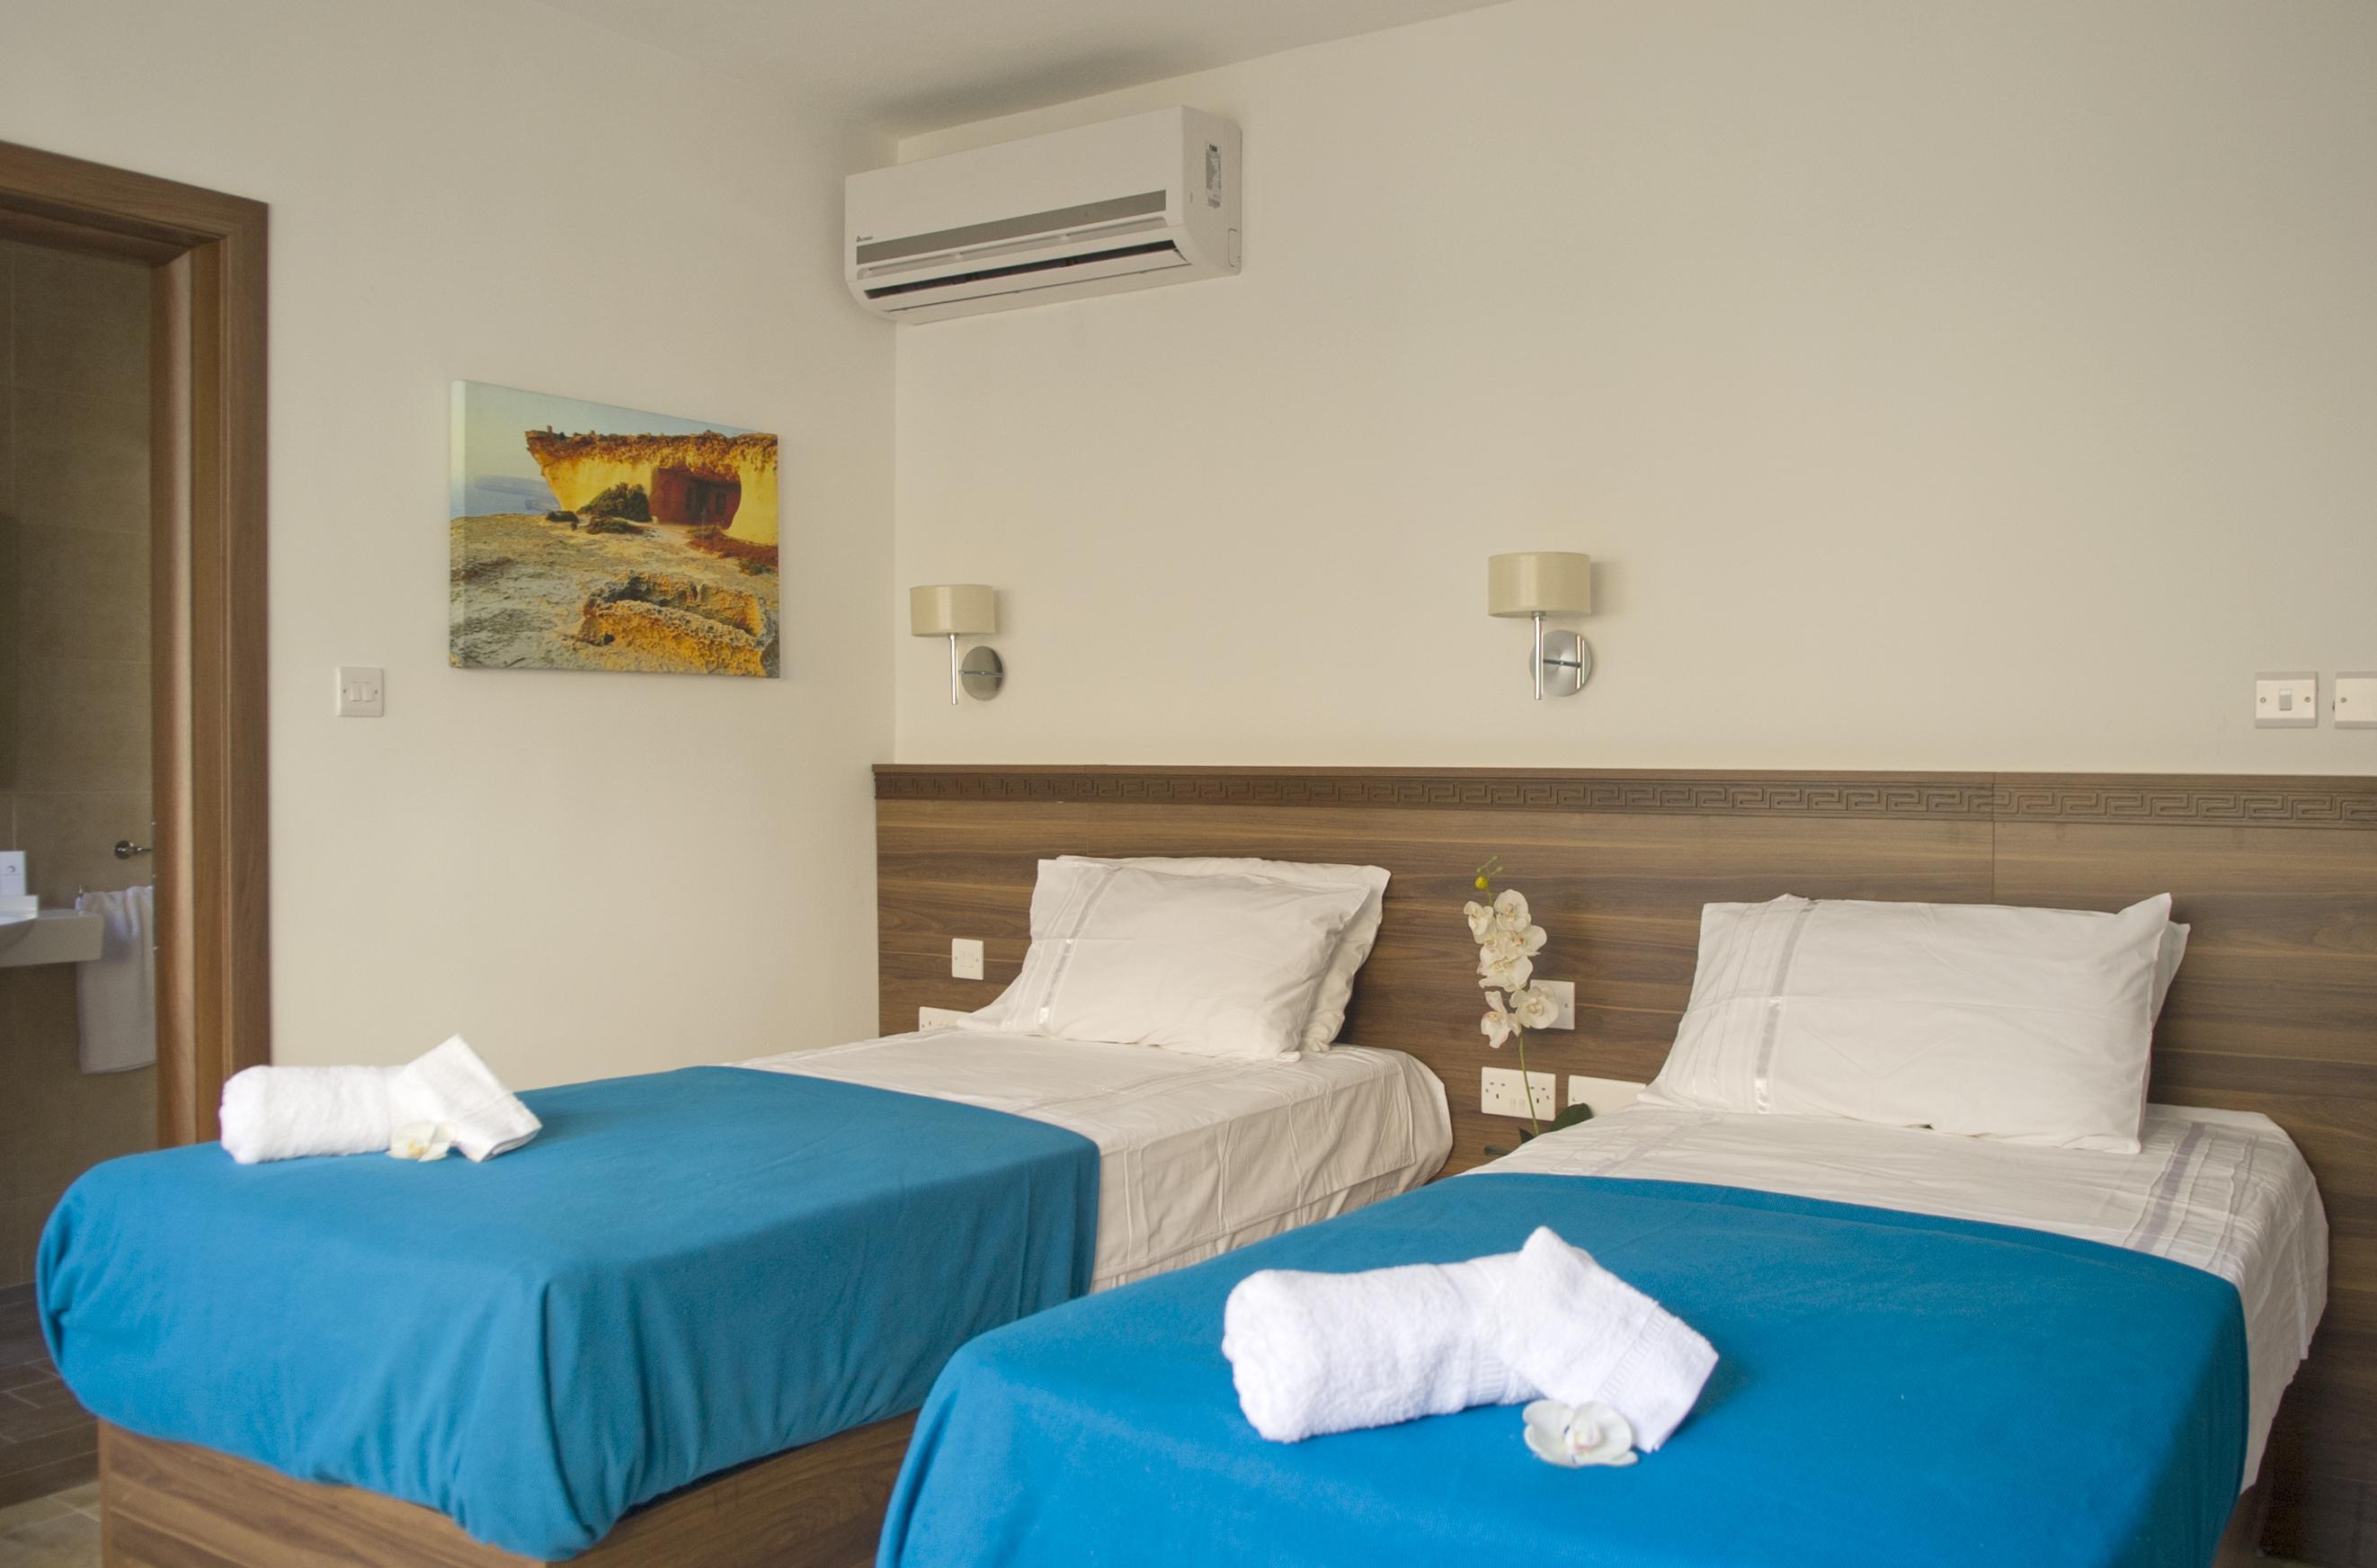 Holidays at Slimiza Suites in Sliema, Malta